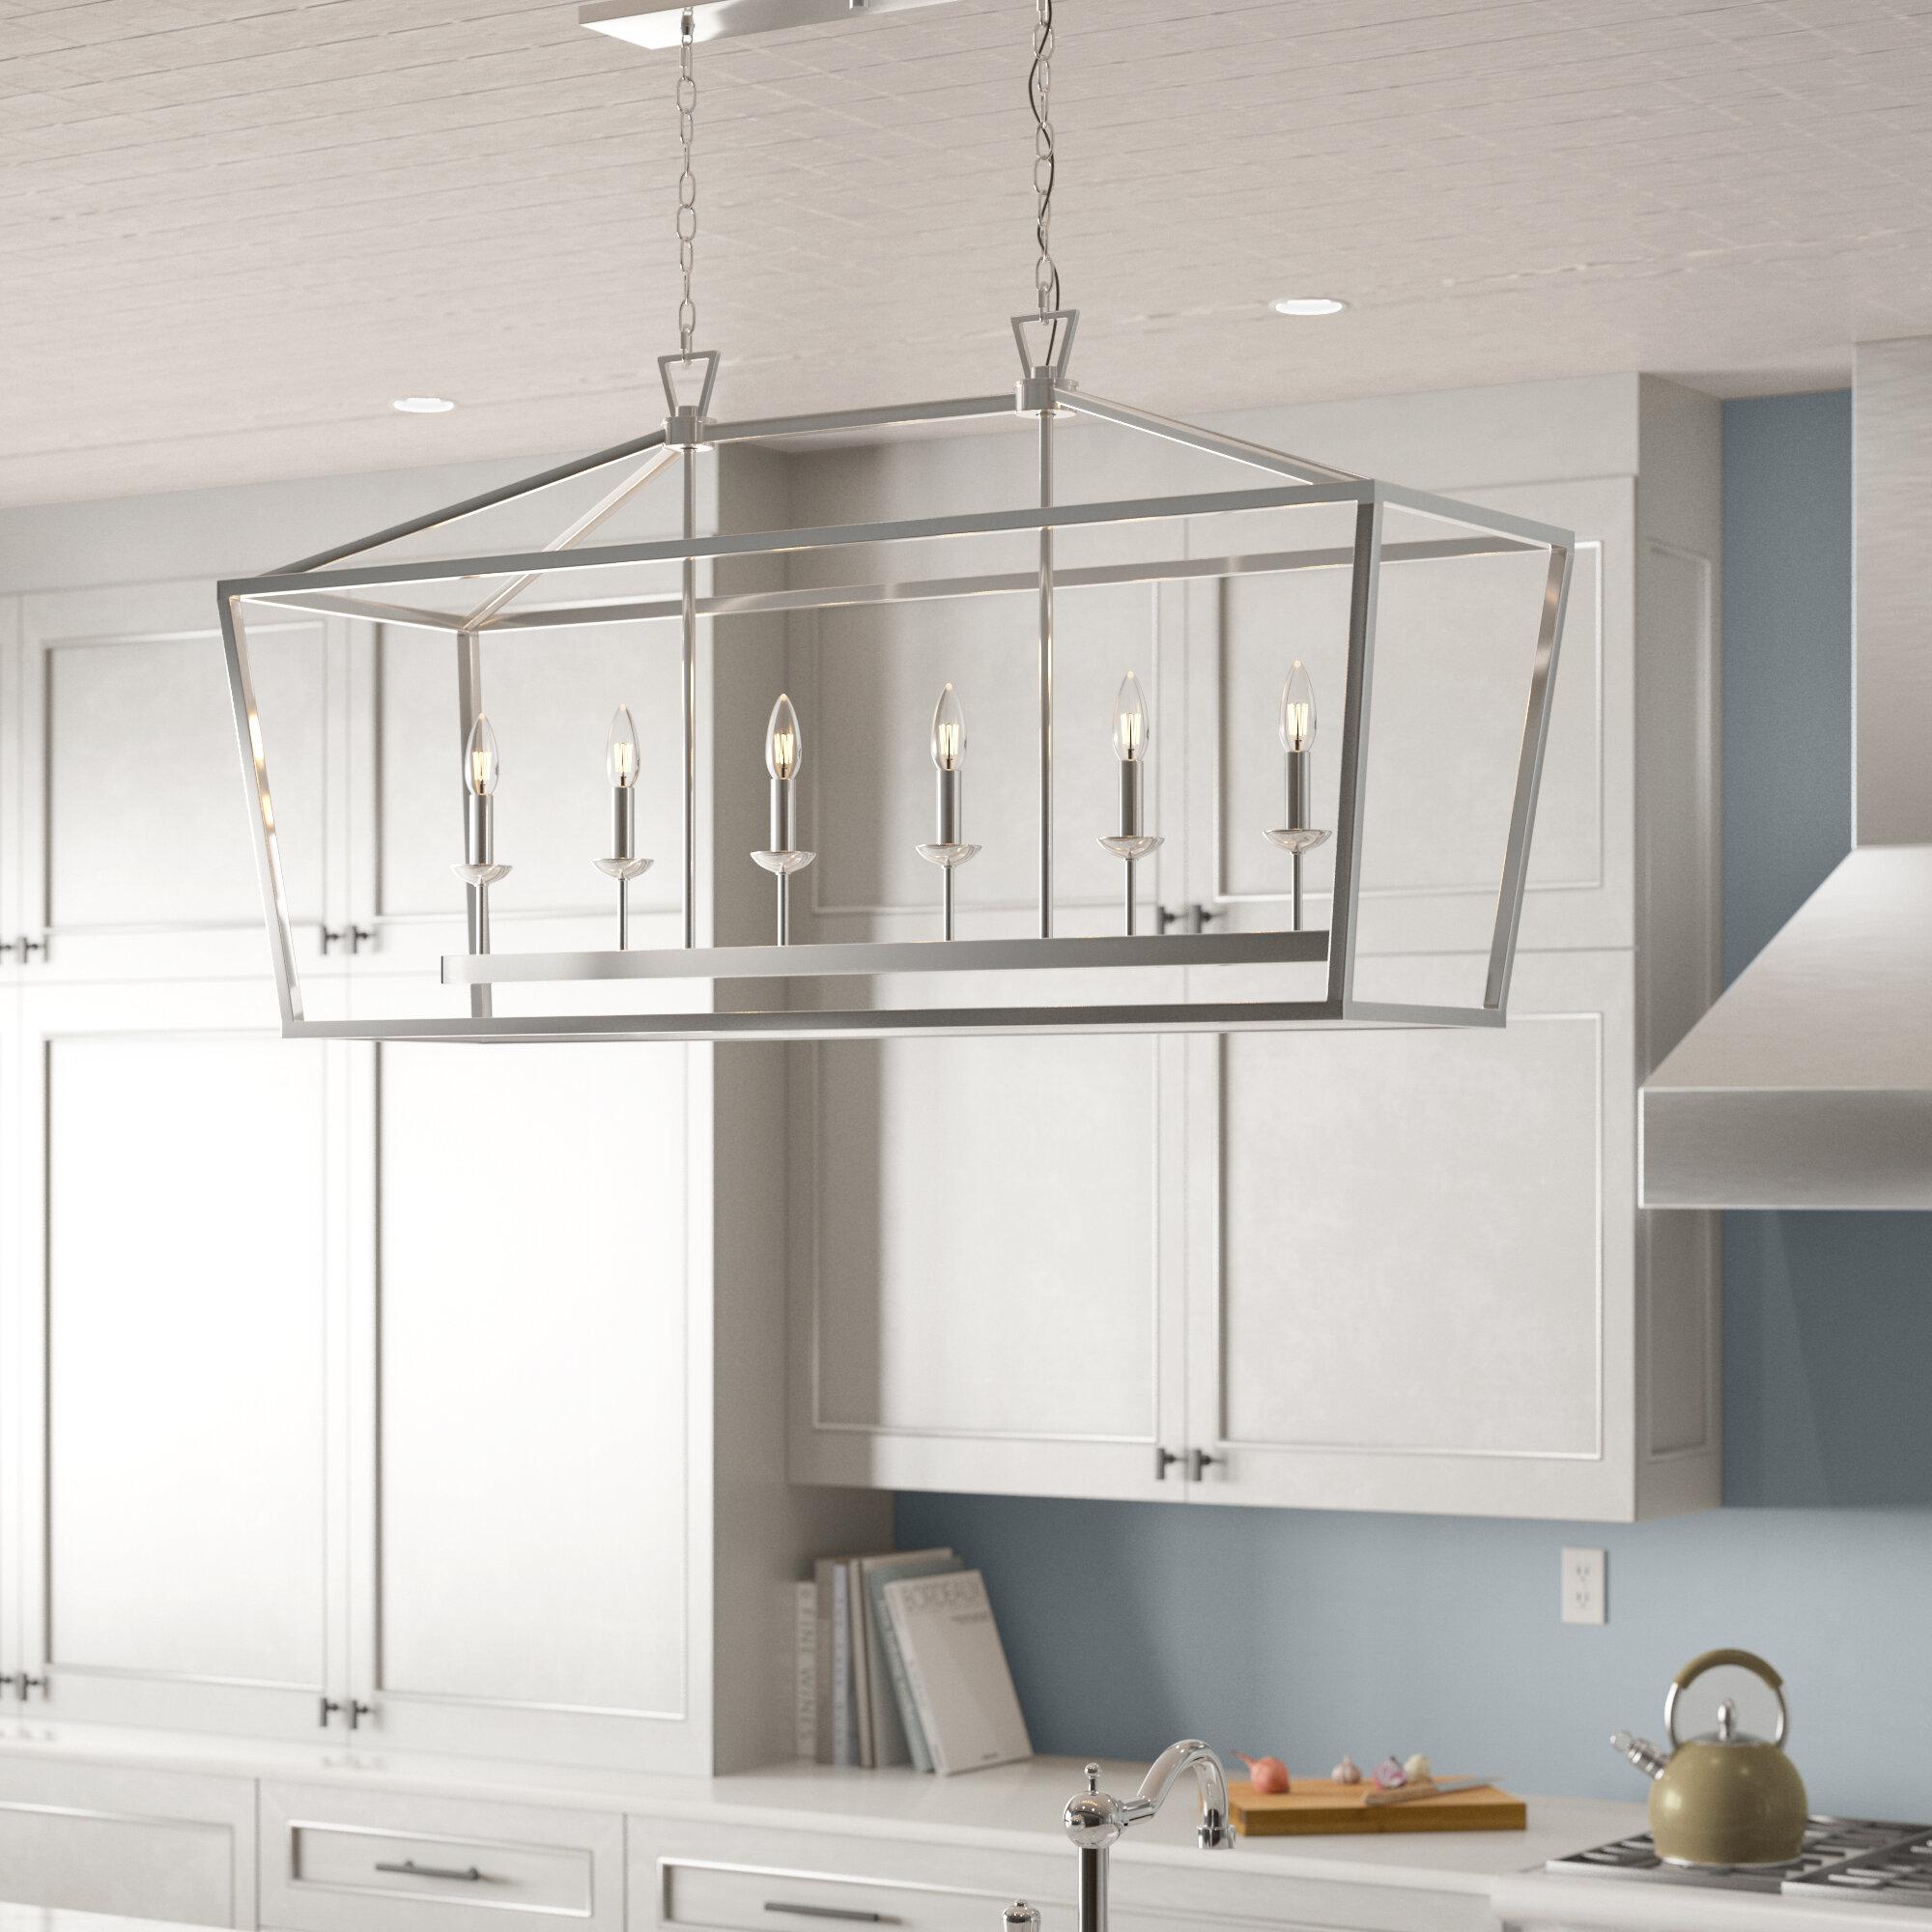 Delon 8 - Light Kitchen Island Linear Pendant